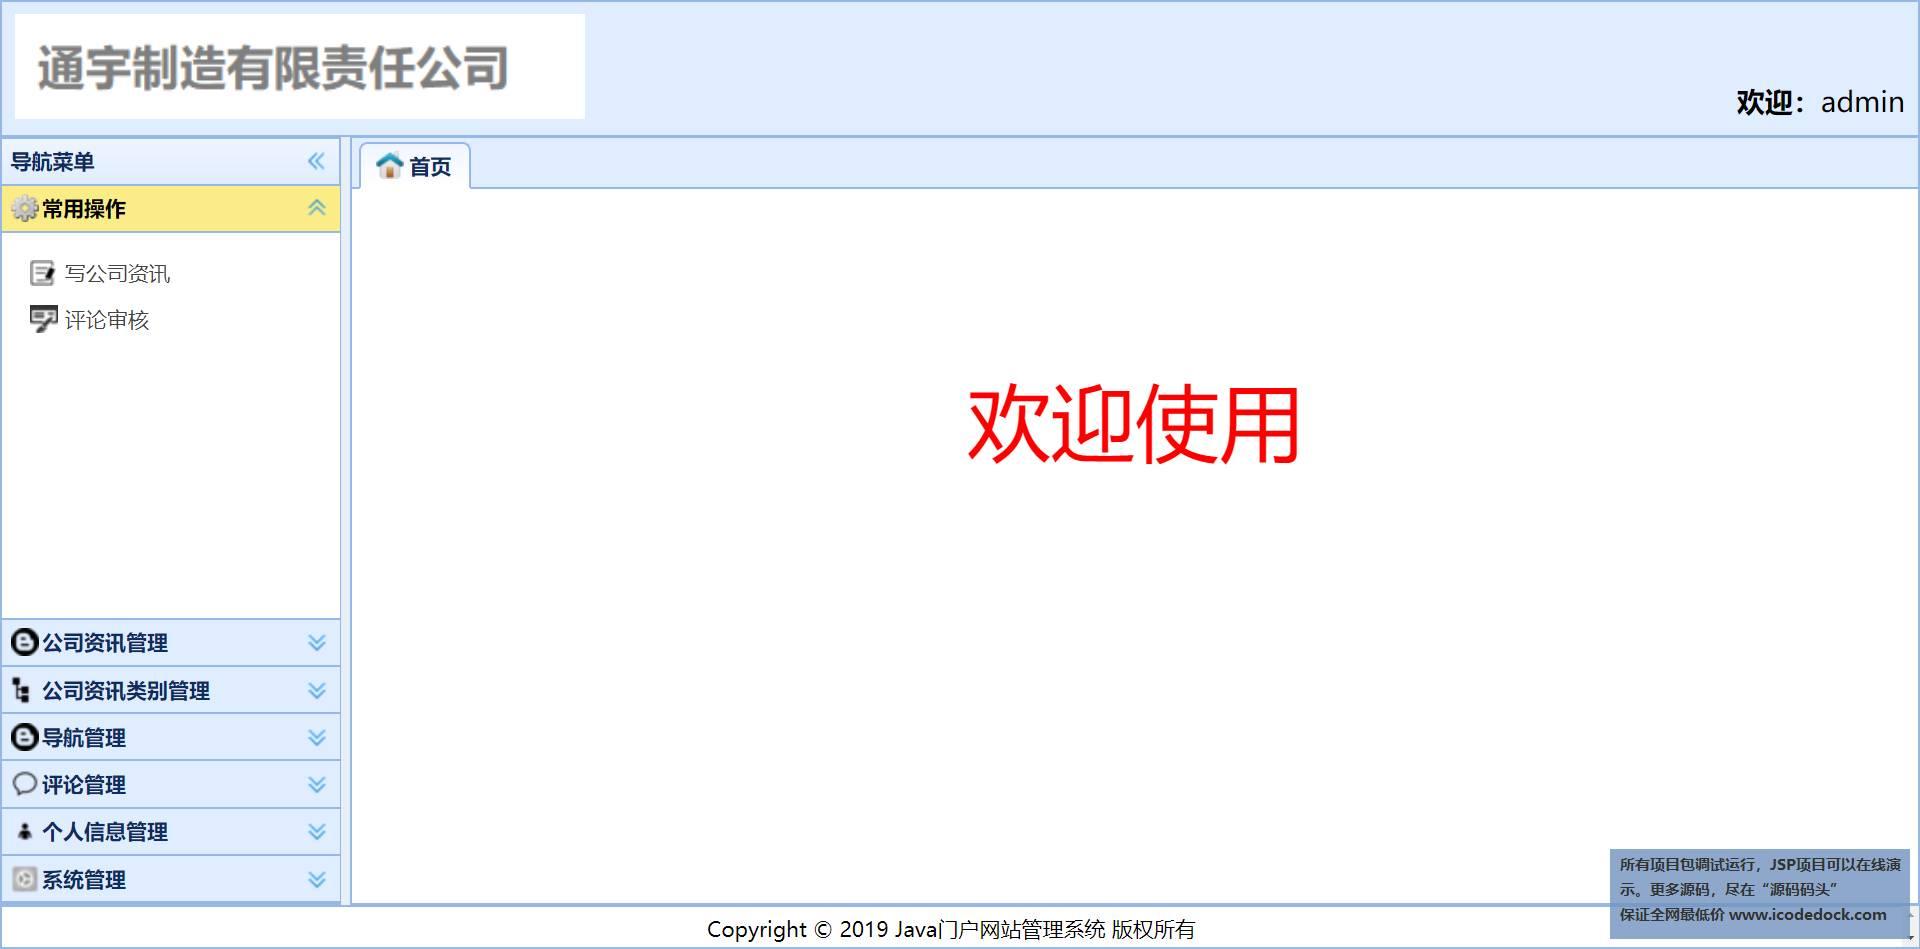 ssm企业网站源码下载(php网站源码 下载) (https://www.oilcn.net.cn/) 网站运营 第3张